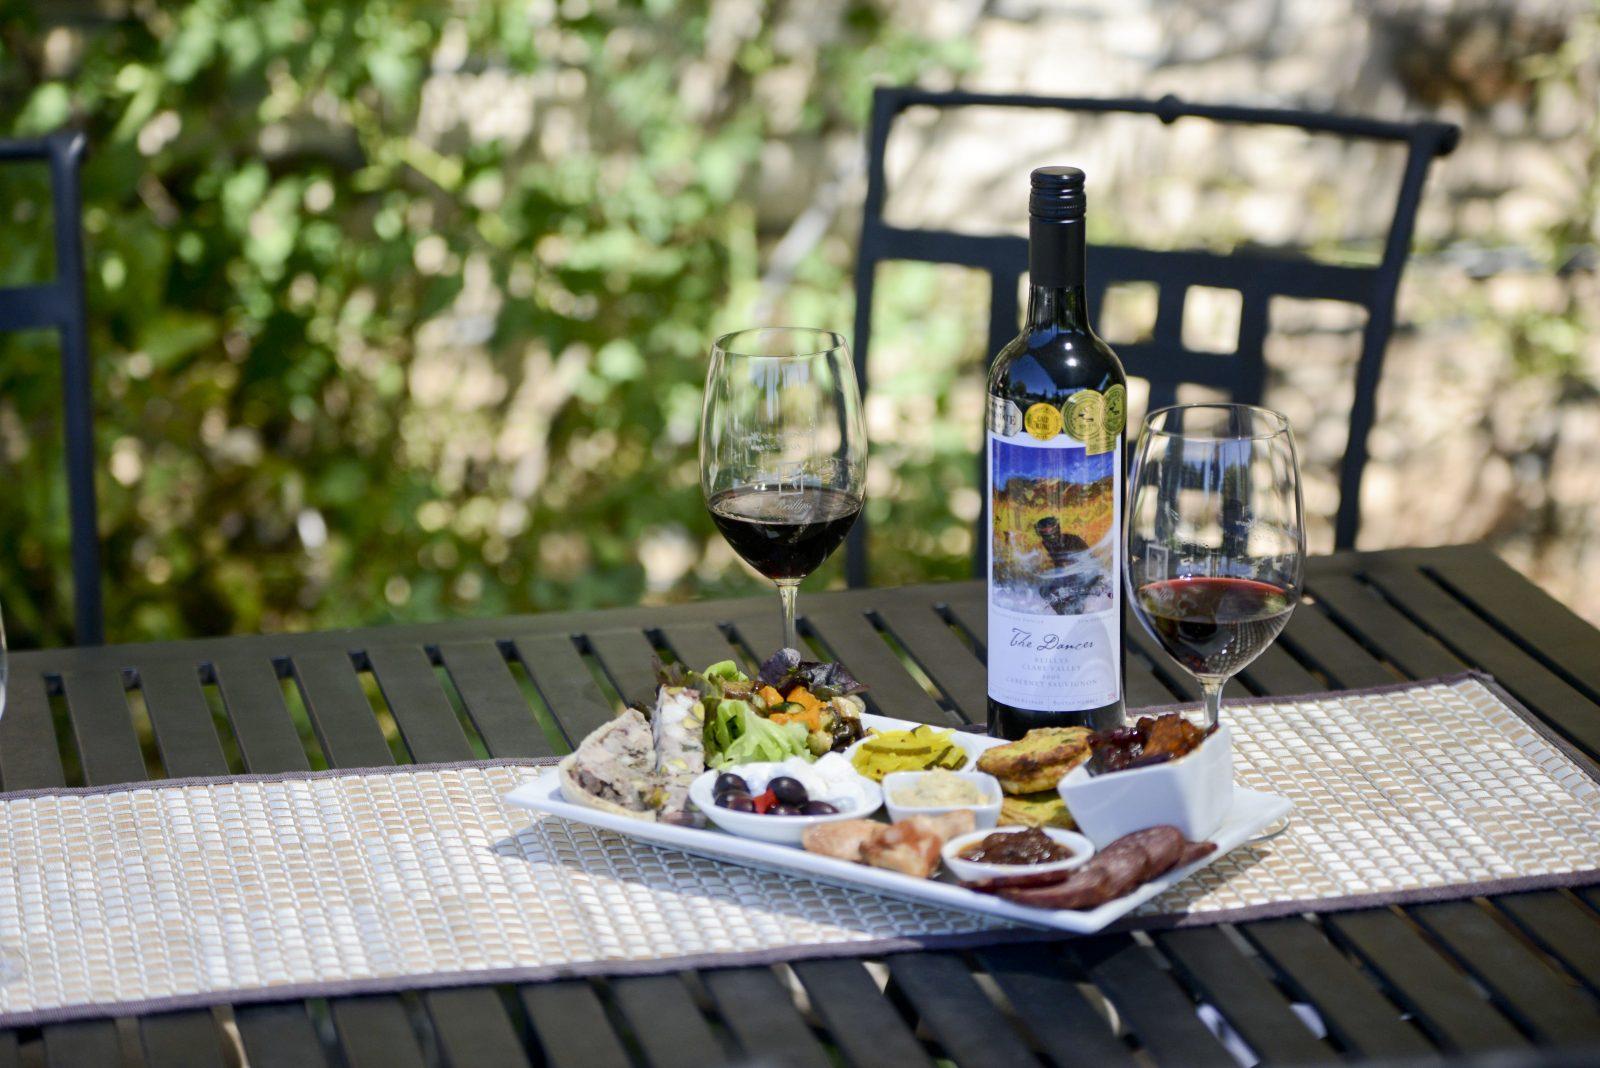 Reillys Restaurant - Wine with Gourmet Platter